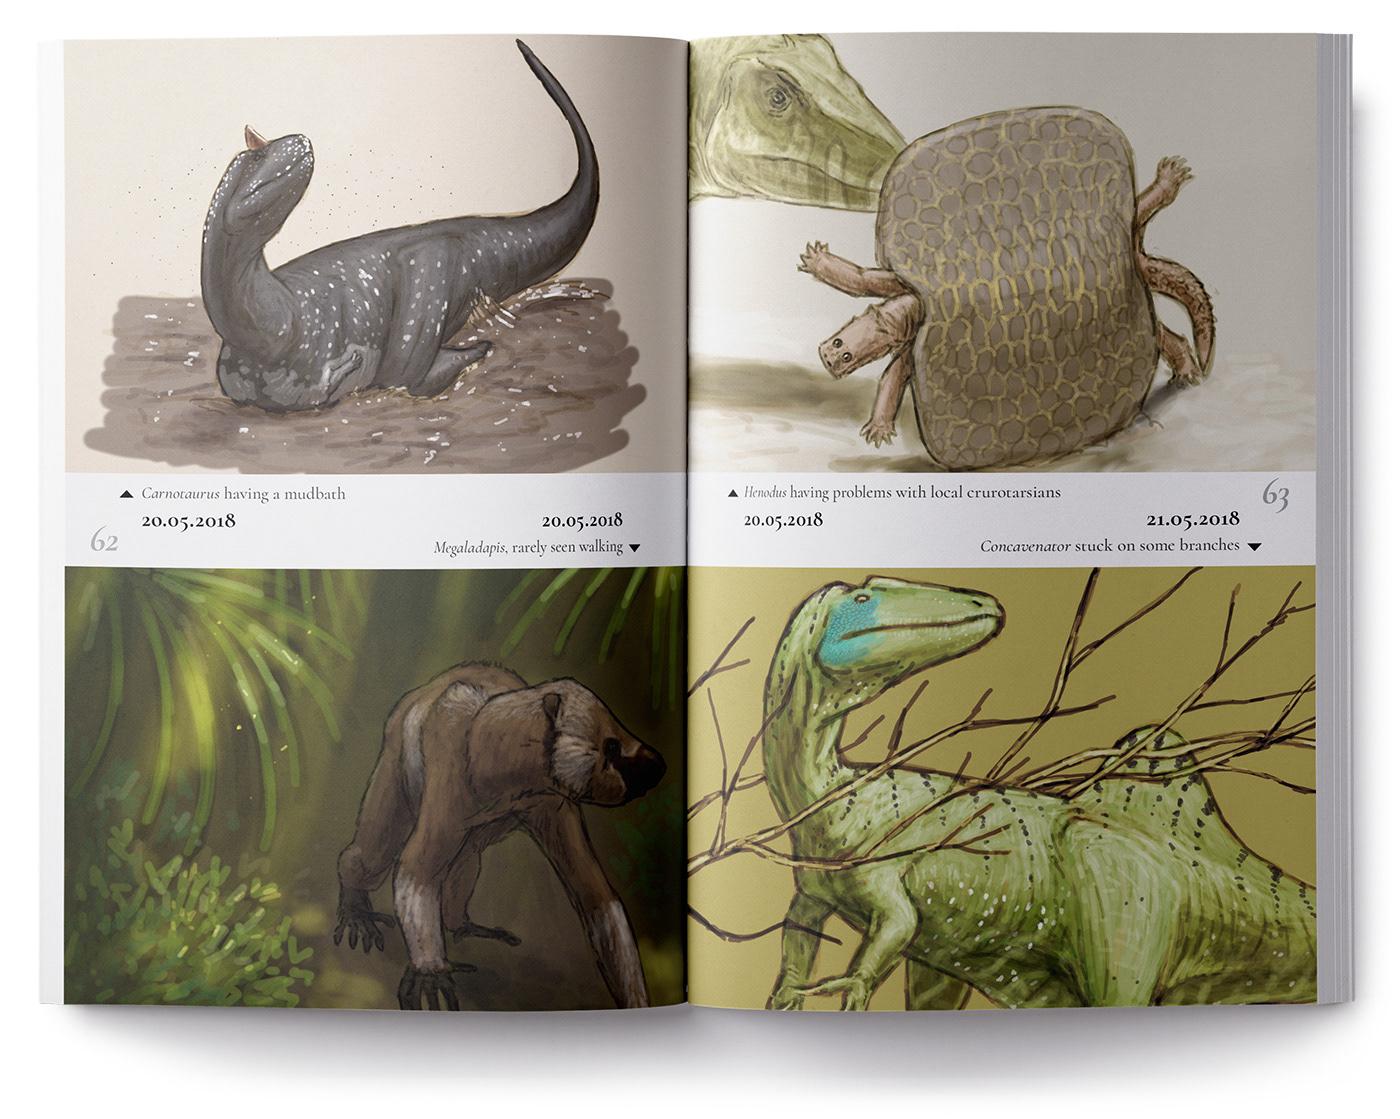 Dinosaur reptile animal SciArt scientific illustration paleontology Fossil Nature Prehistory science